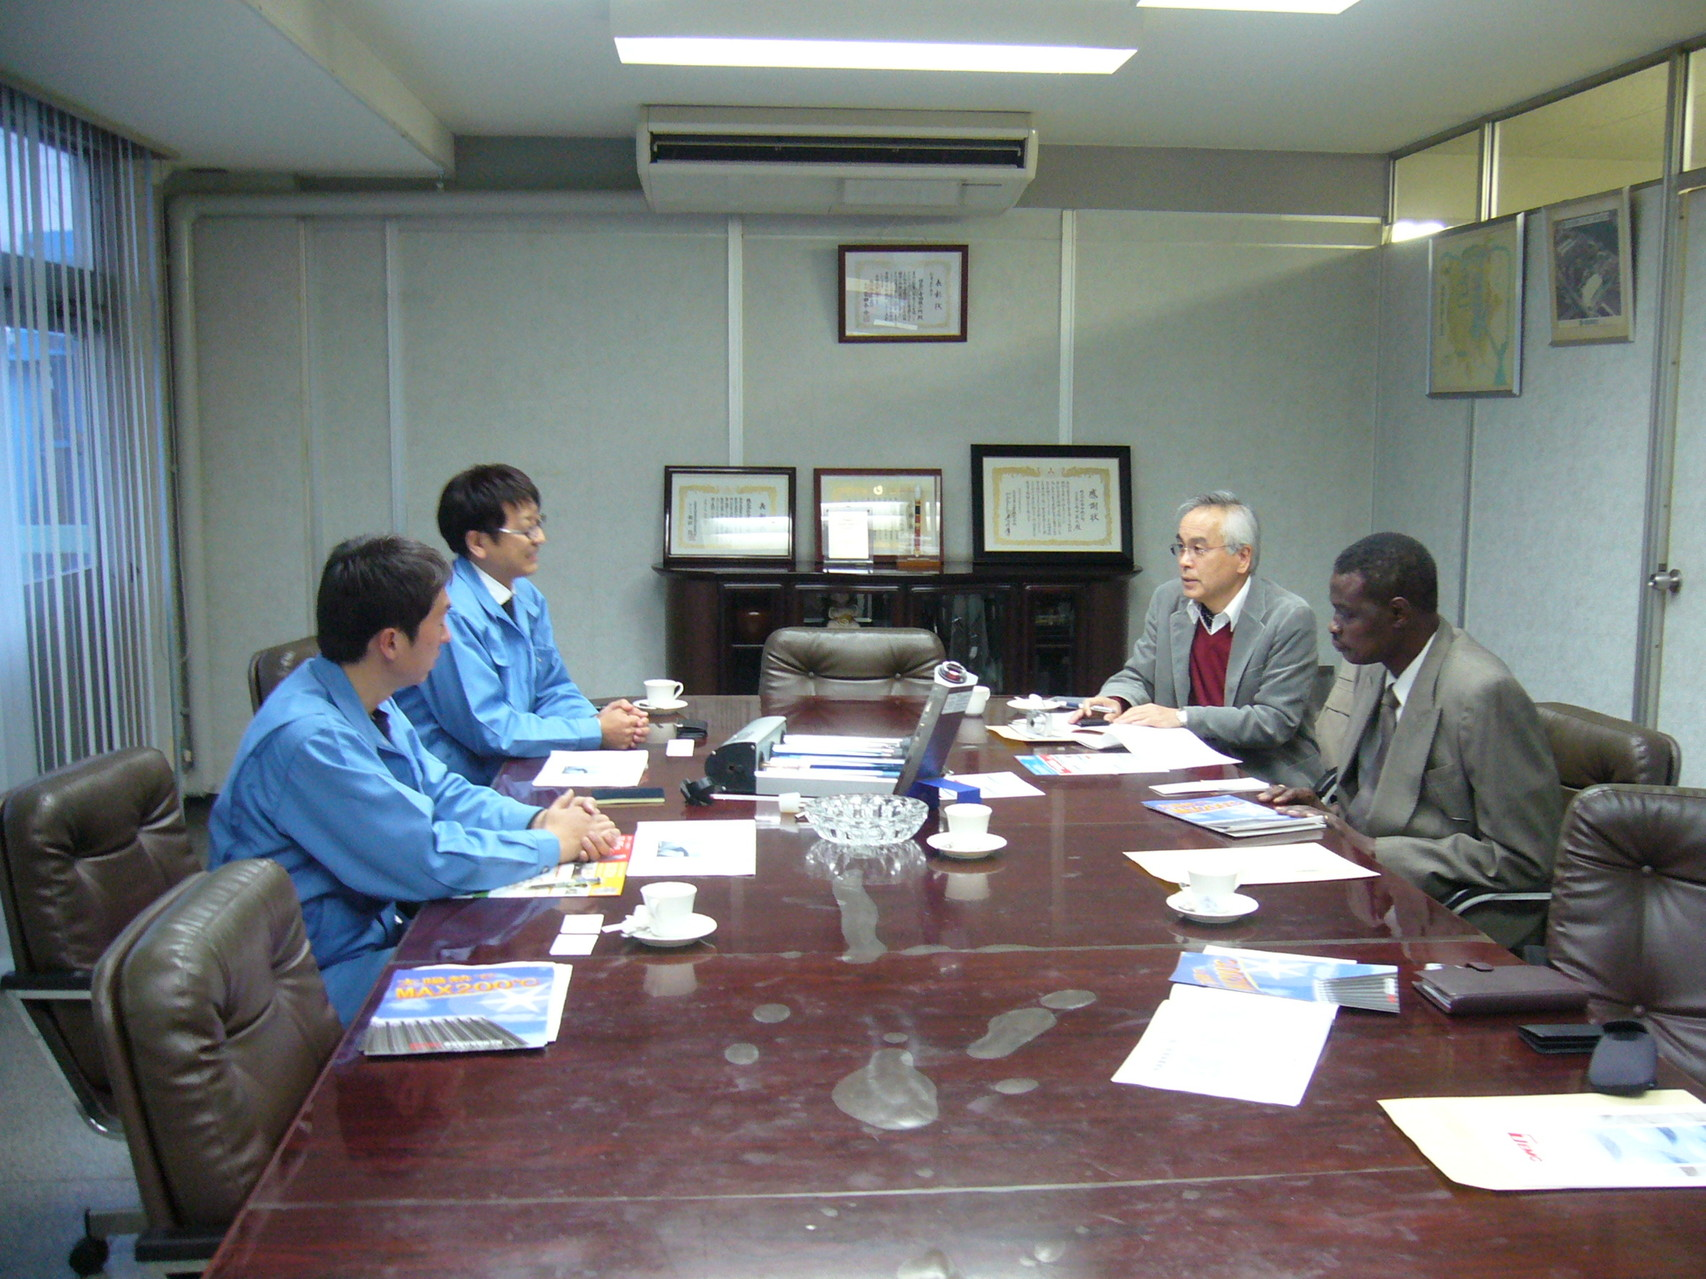 2009 T社太陽熱温水器技術紹介 スーダン大使